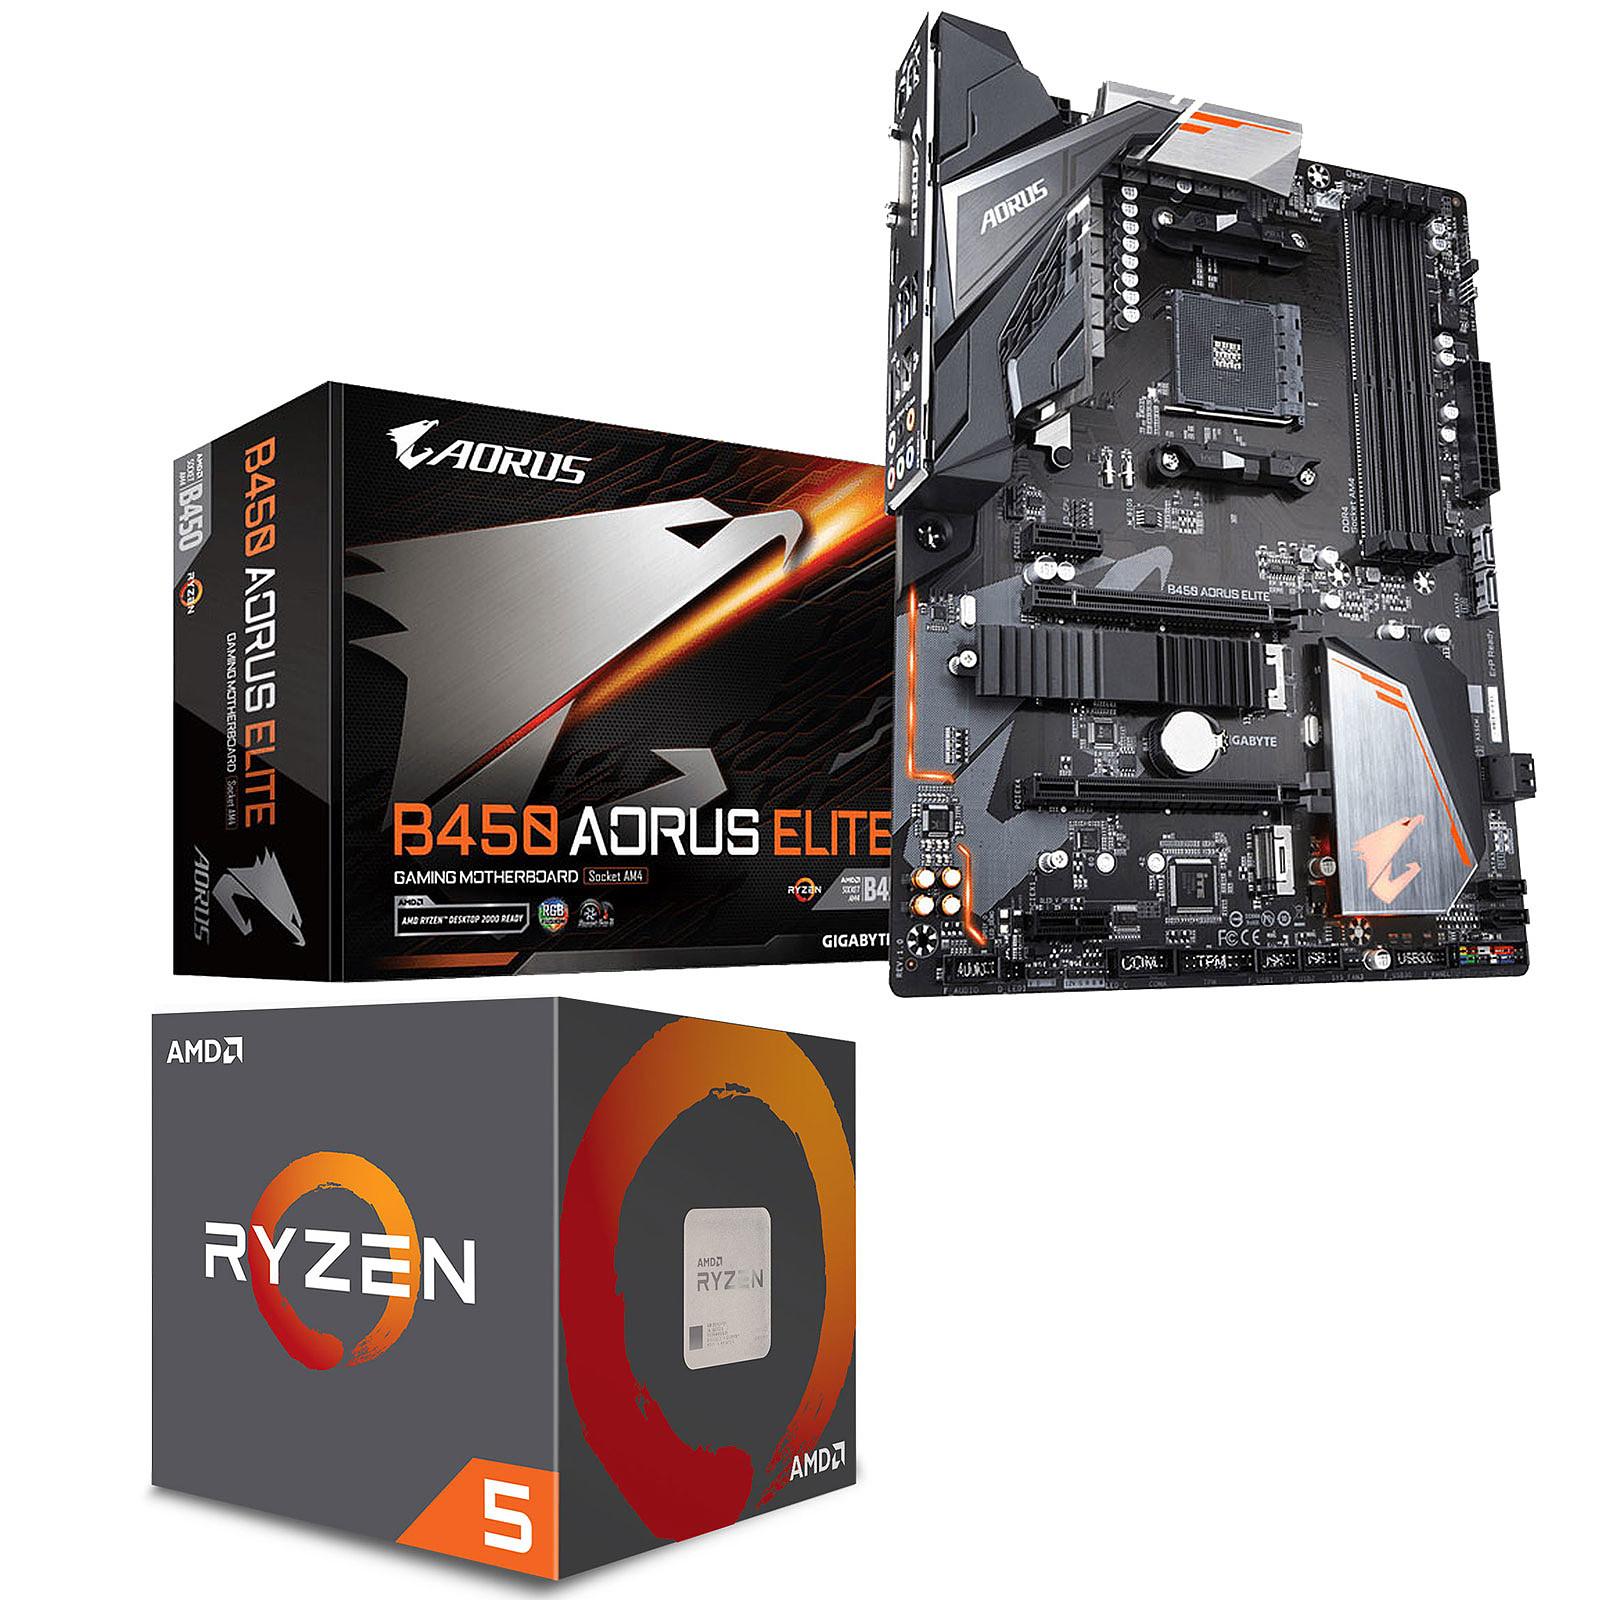 Kit Upgrade PC AMD Ryzen 5 2600 Gigabyte B450 AORUS ELITE